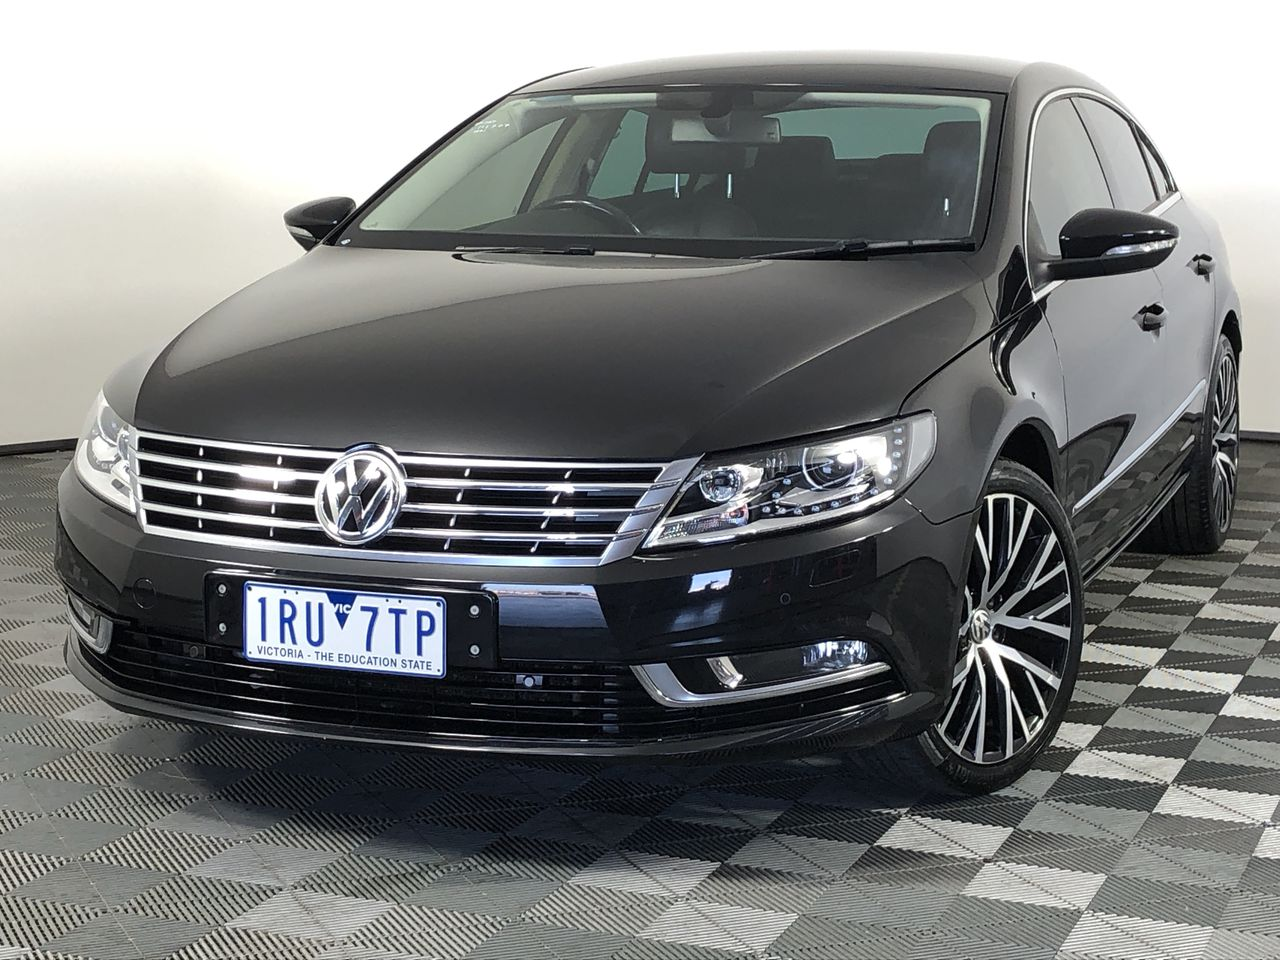 2015 Volkswagen CC 130TDI 3CC Turbo Diesel Automatic Coupe